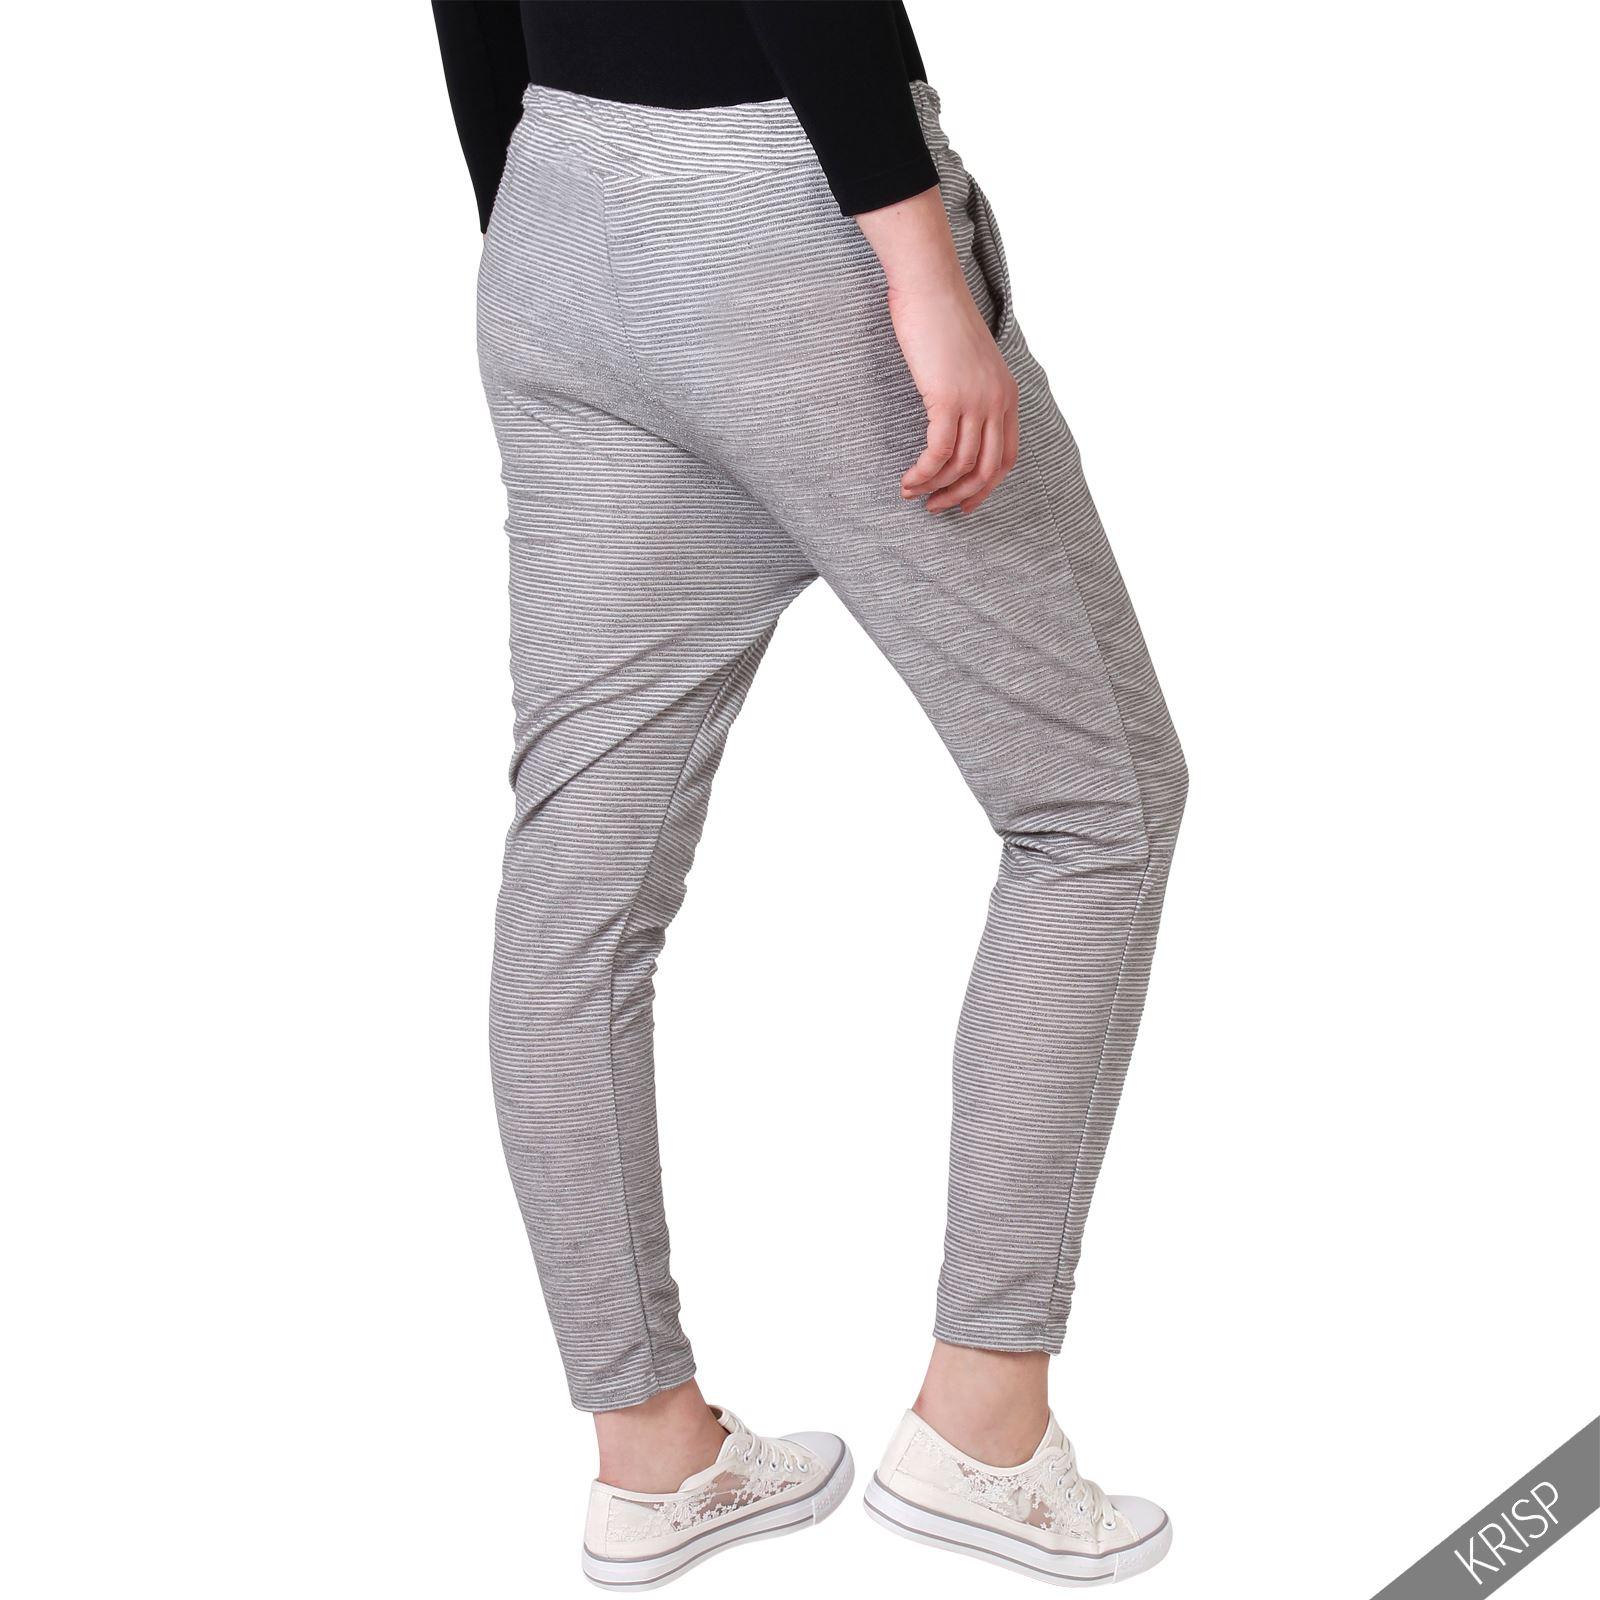 PLUS SIZE Graphic Velour Plum High Rise Drawstring Waist Running Late Pants. PLUS SIZE Graphic Velour Plum High Rise Drawstring Waist Running Late Pants. Swatches. PLUS SIZE Graphic Velour Plum High Rise Drawstring Waist Running Late Pants. SKU: L_PLUM. Retail: $ Now: $ Size: 1XL 2XL Size Chart.